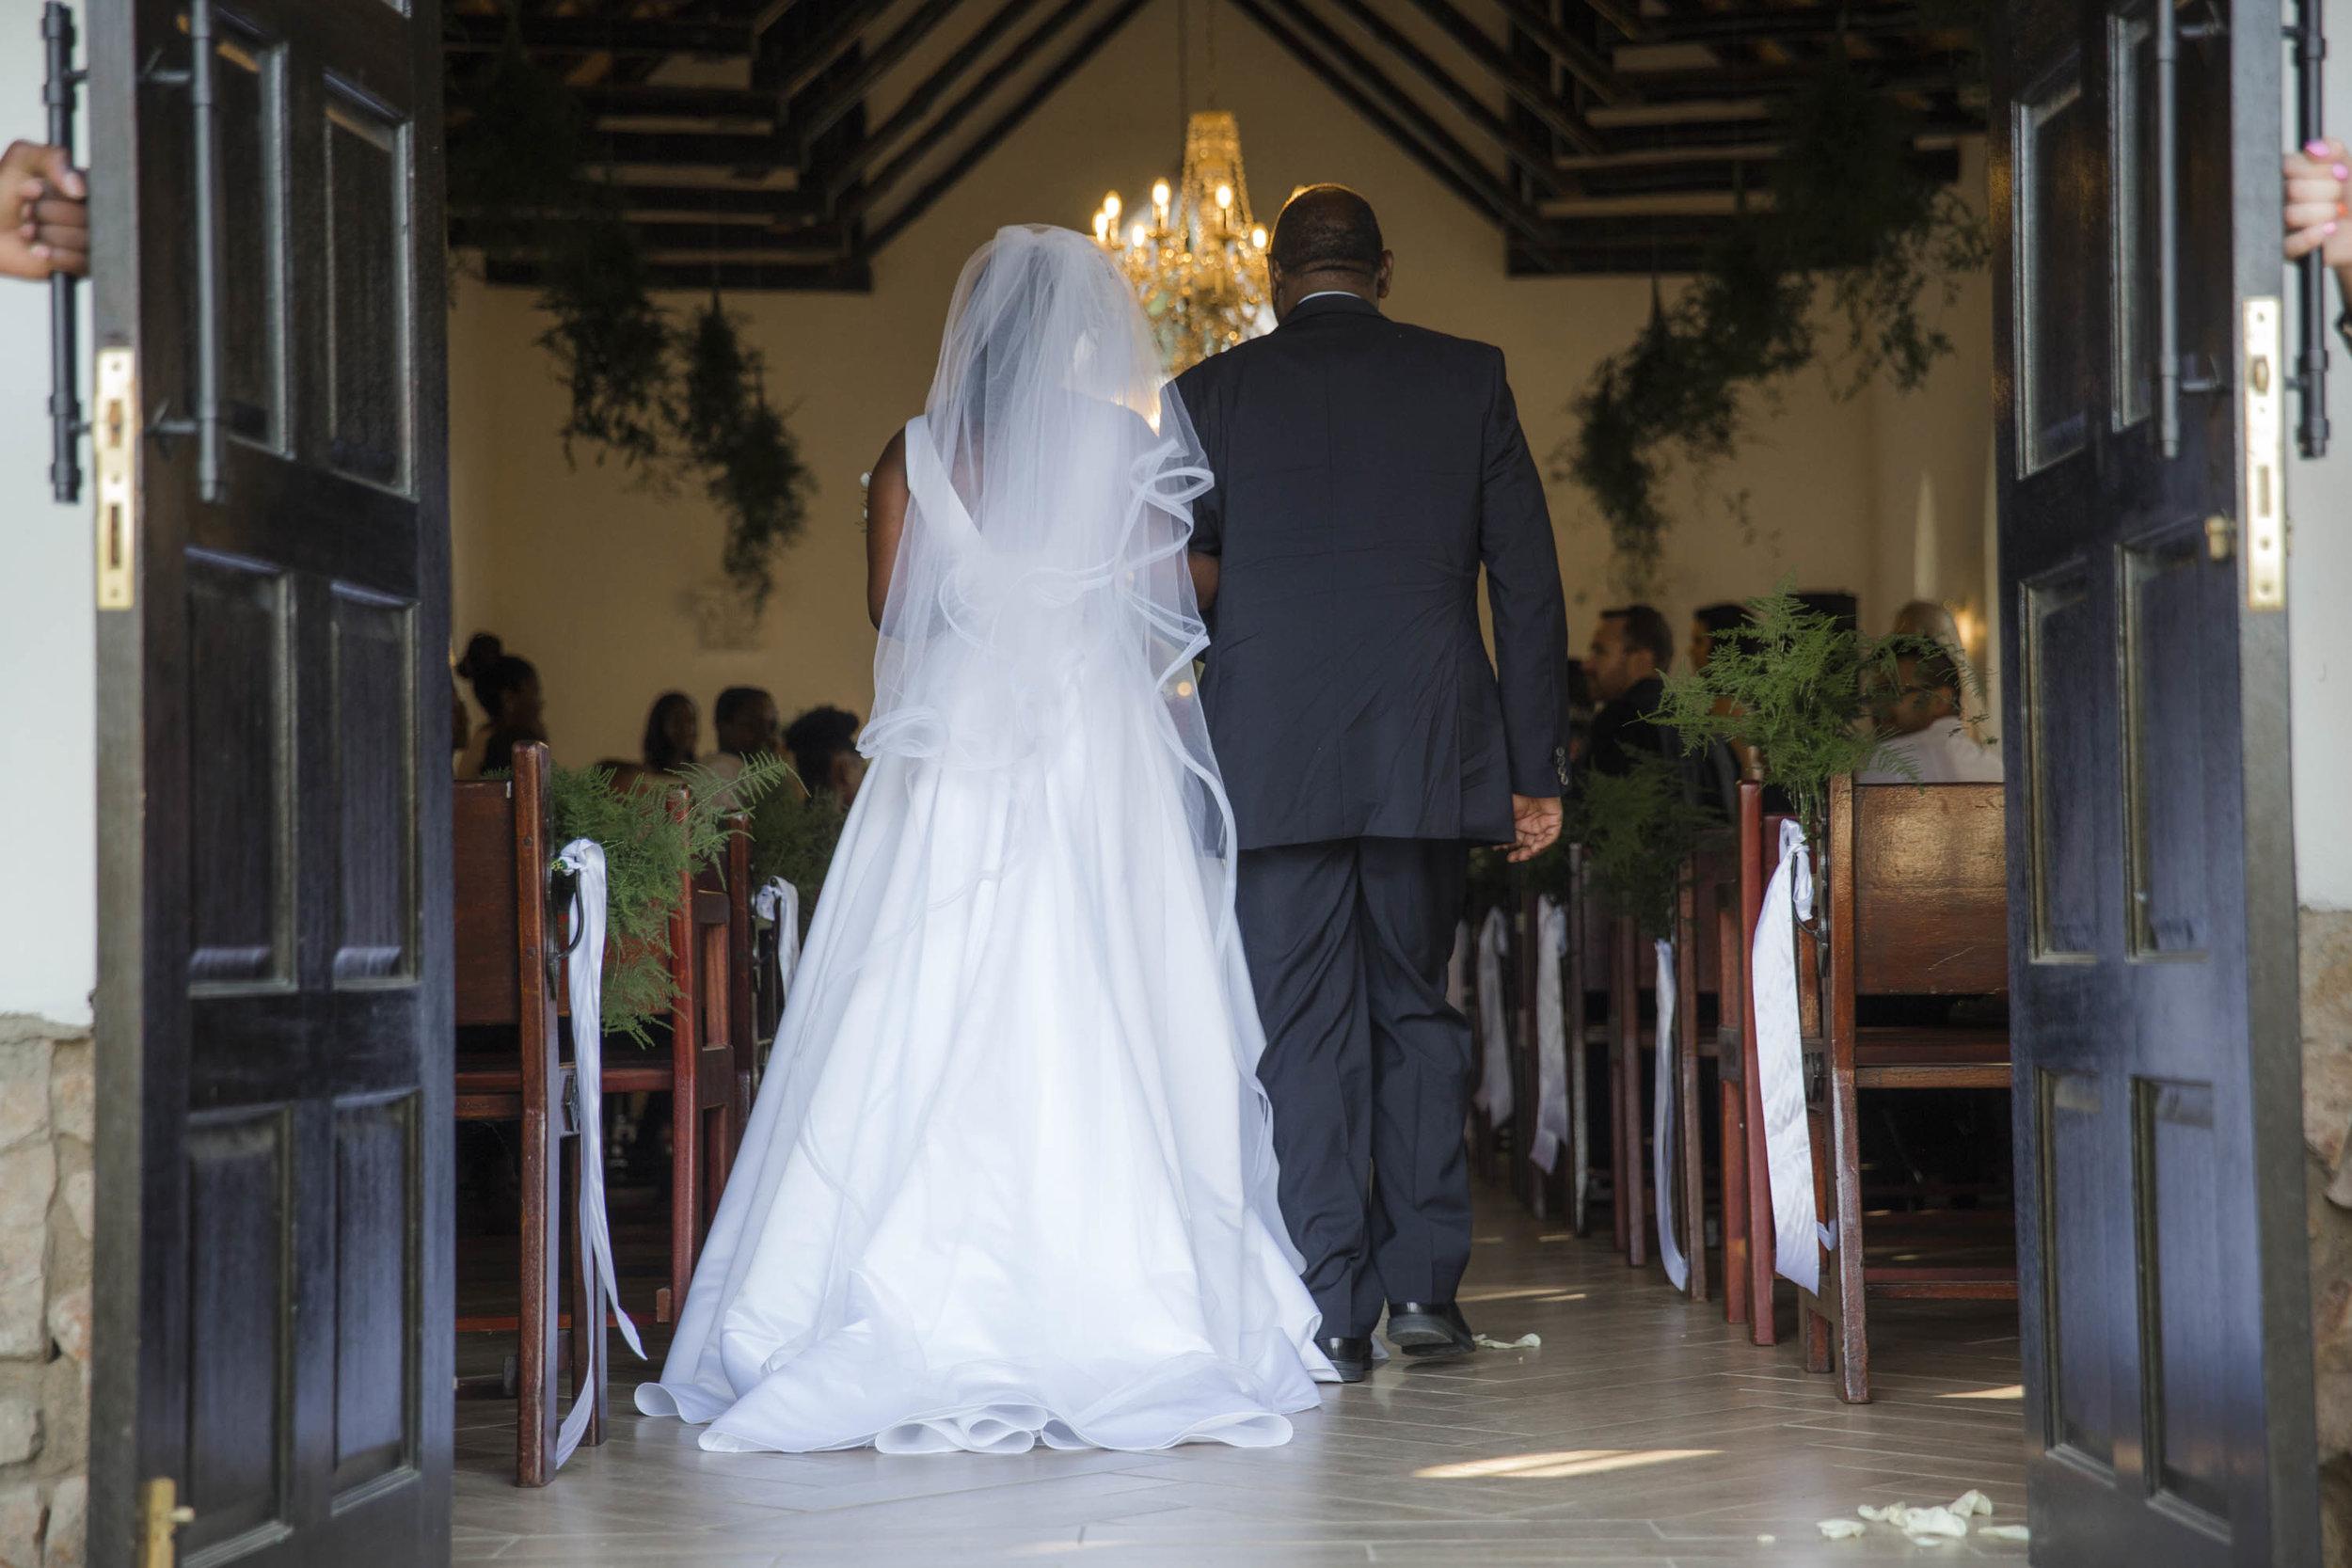 062-wedding-photography-packages-johannesburg.JPG